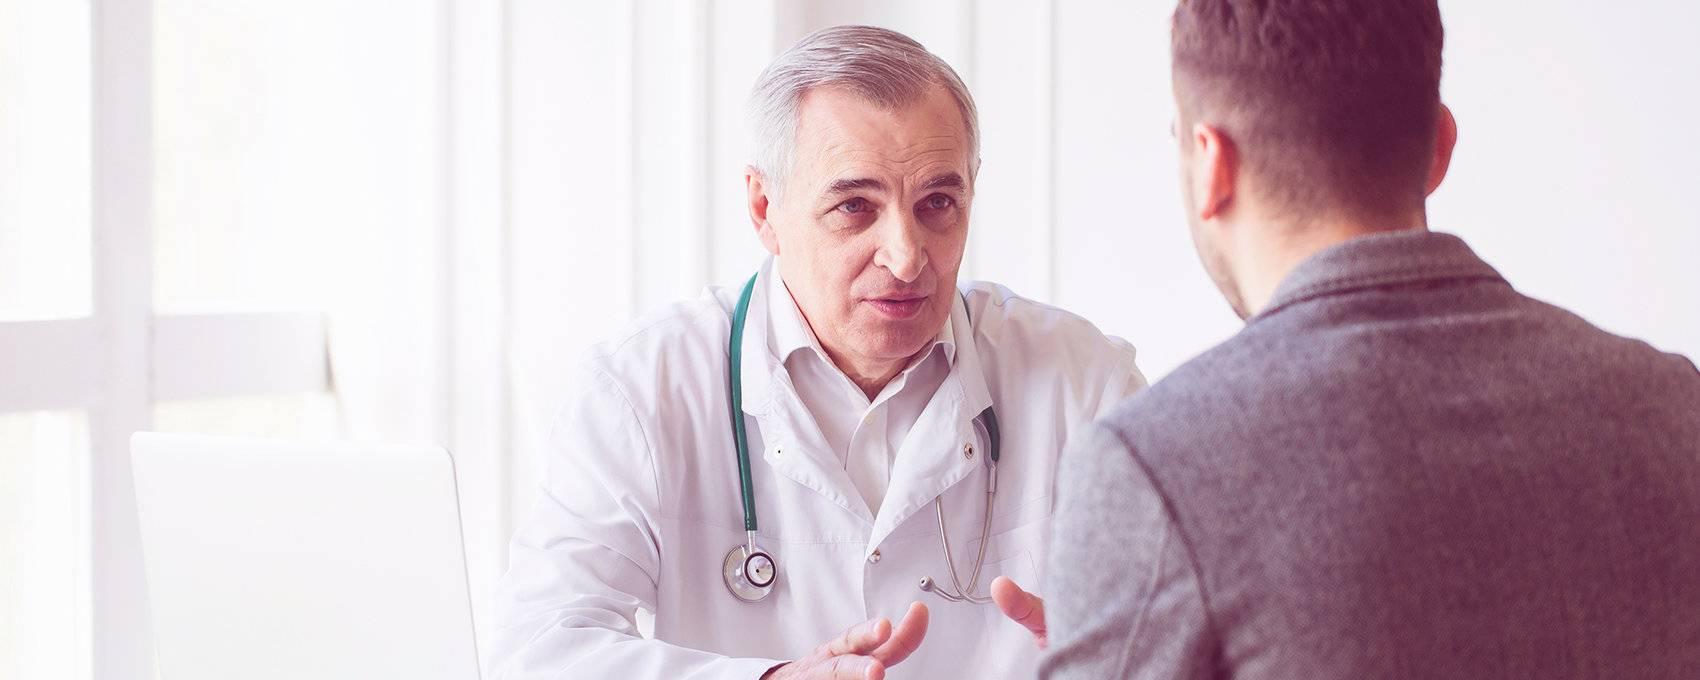 Биопсия яичек у мужчин